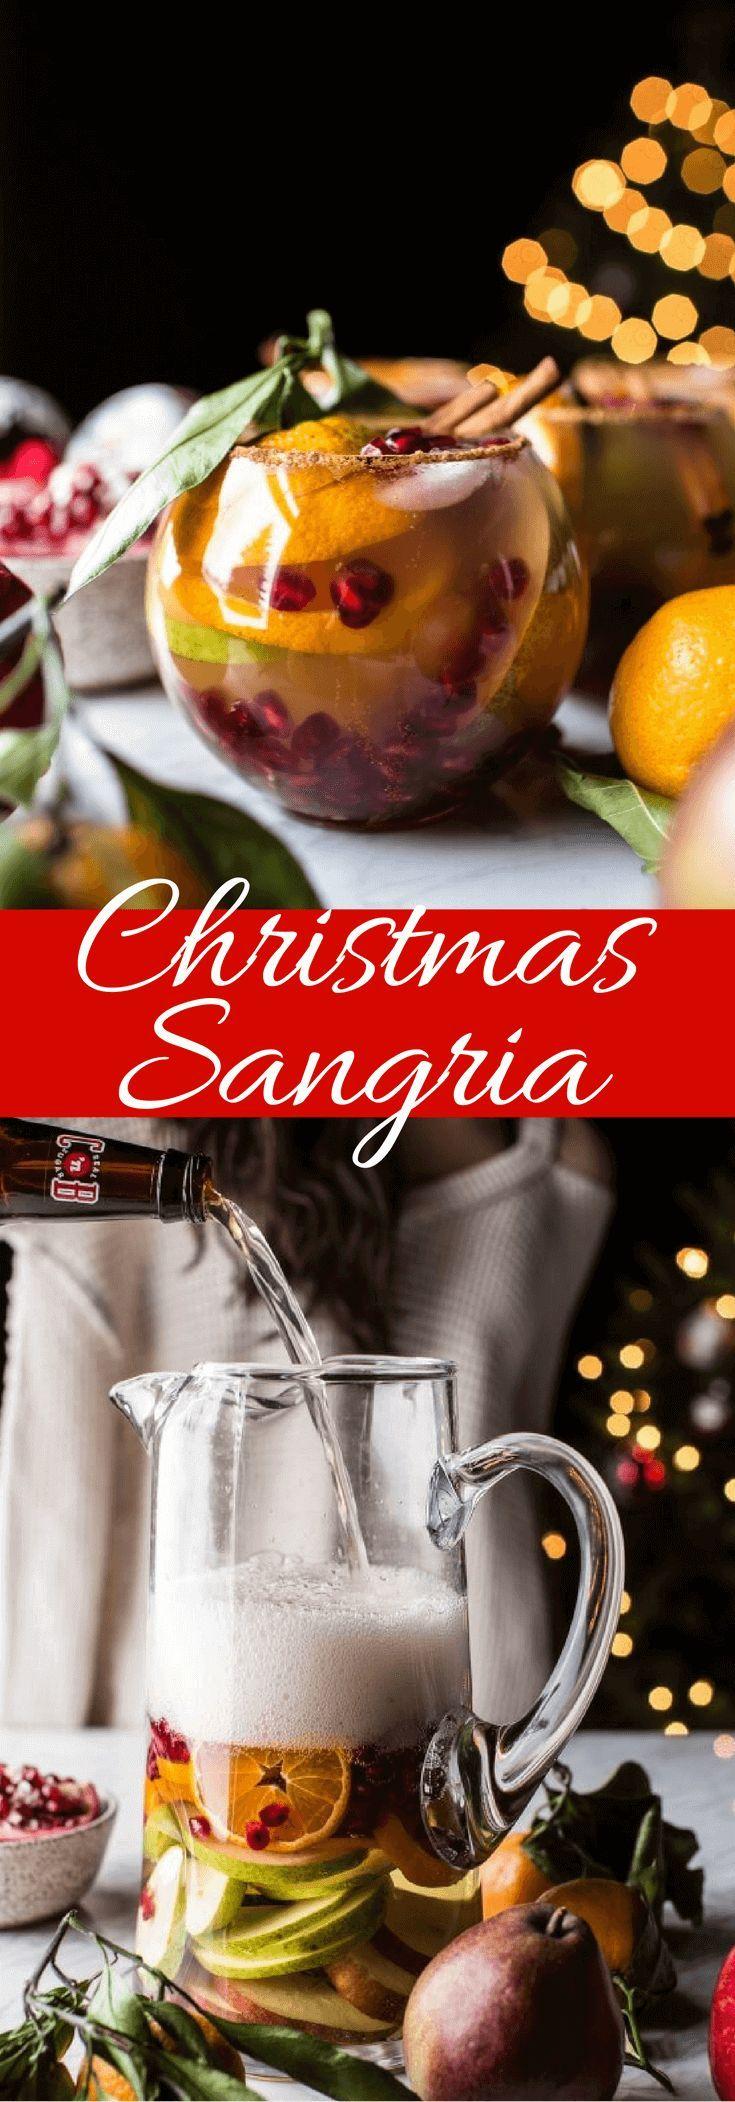 Christmas Sangria | halfbakedharvest.com @hbharvest                                                                                                                                                                                 Más